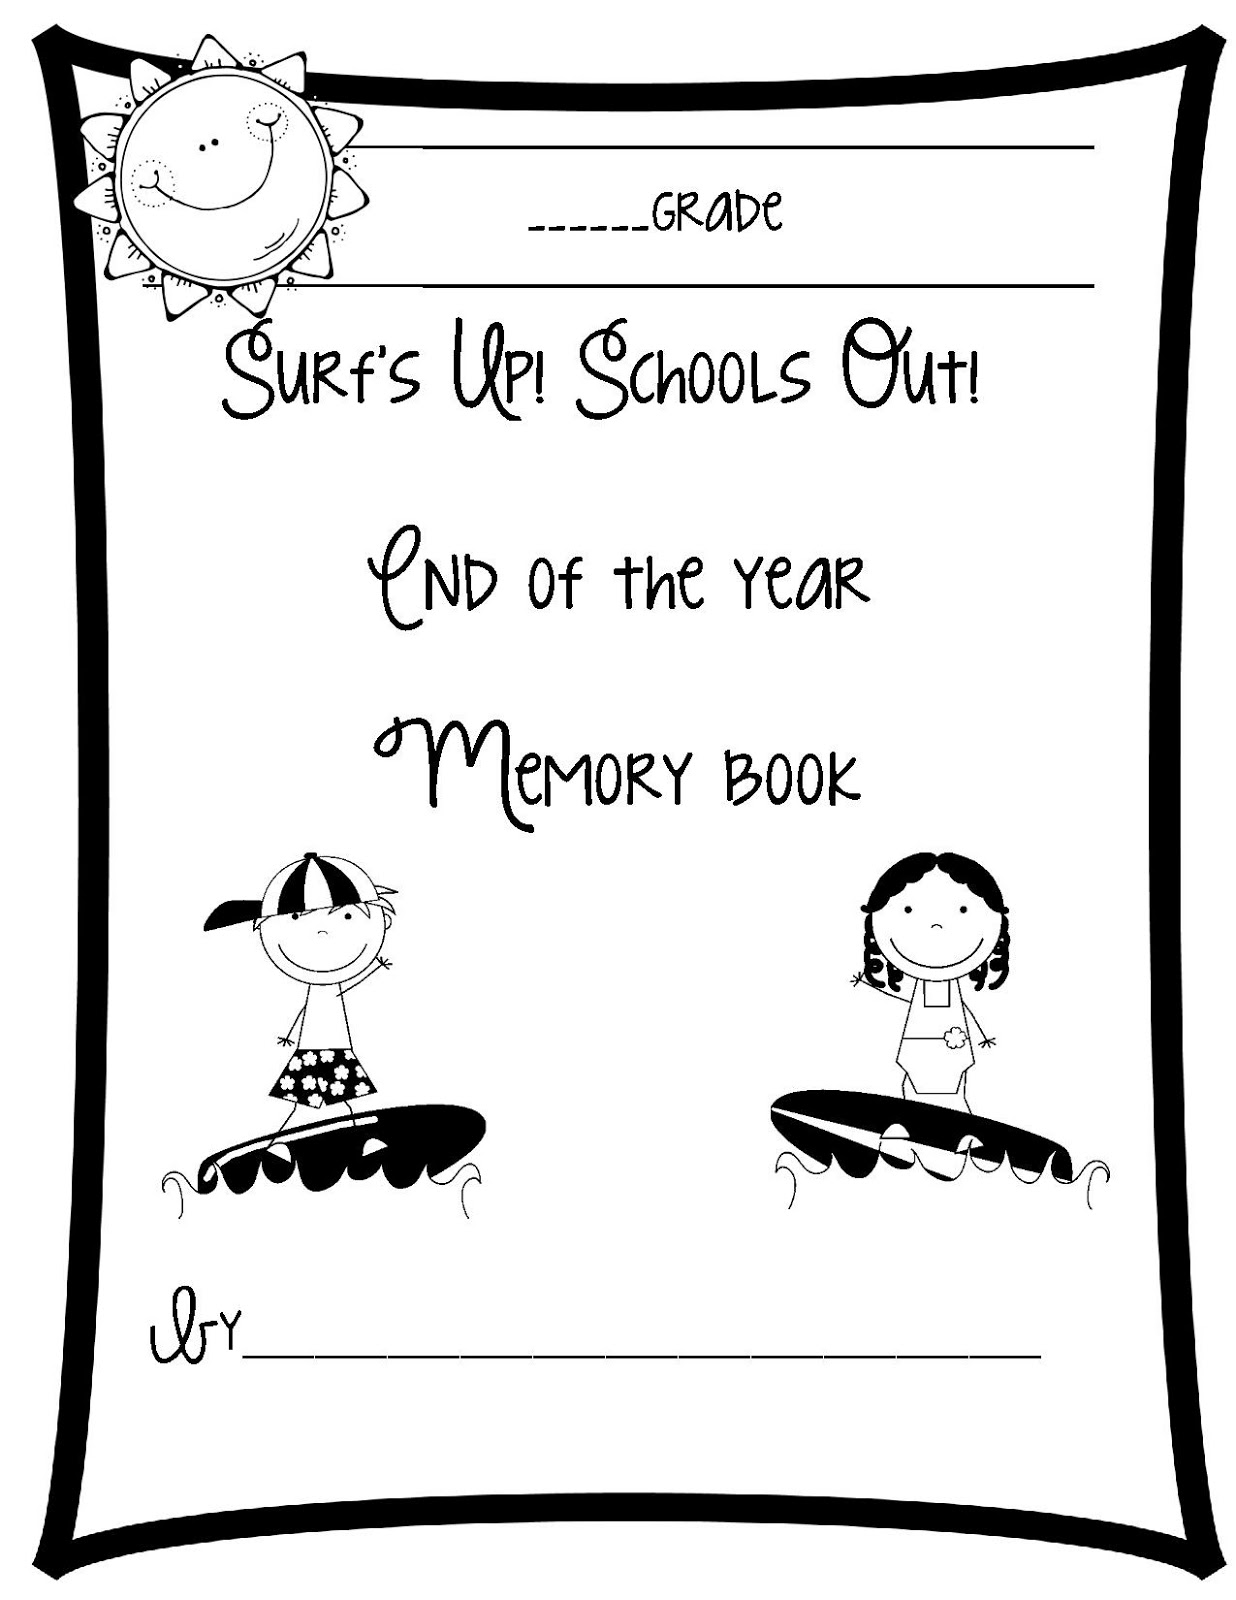 Tales-of-a-First-Grade-Teacher: May 2013